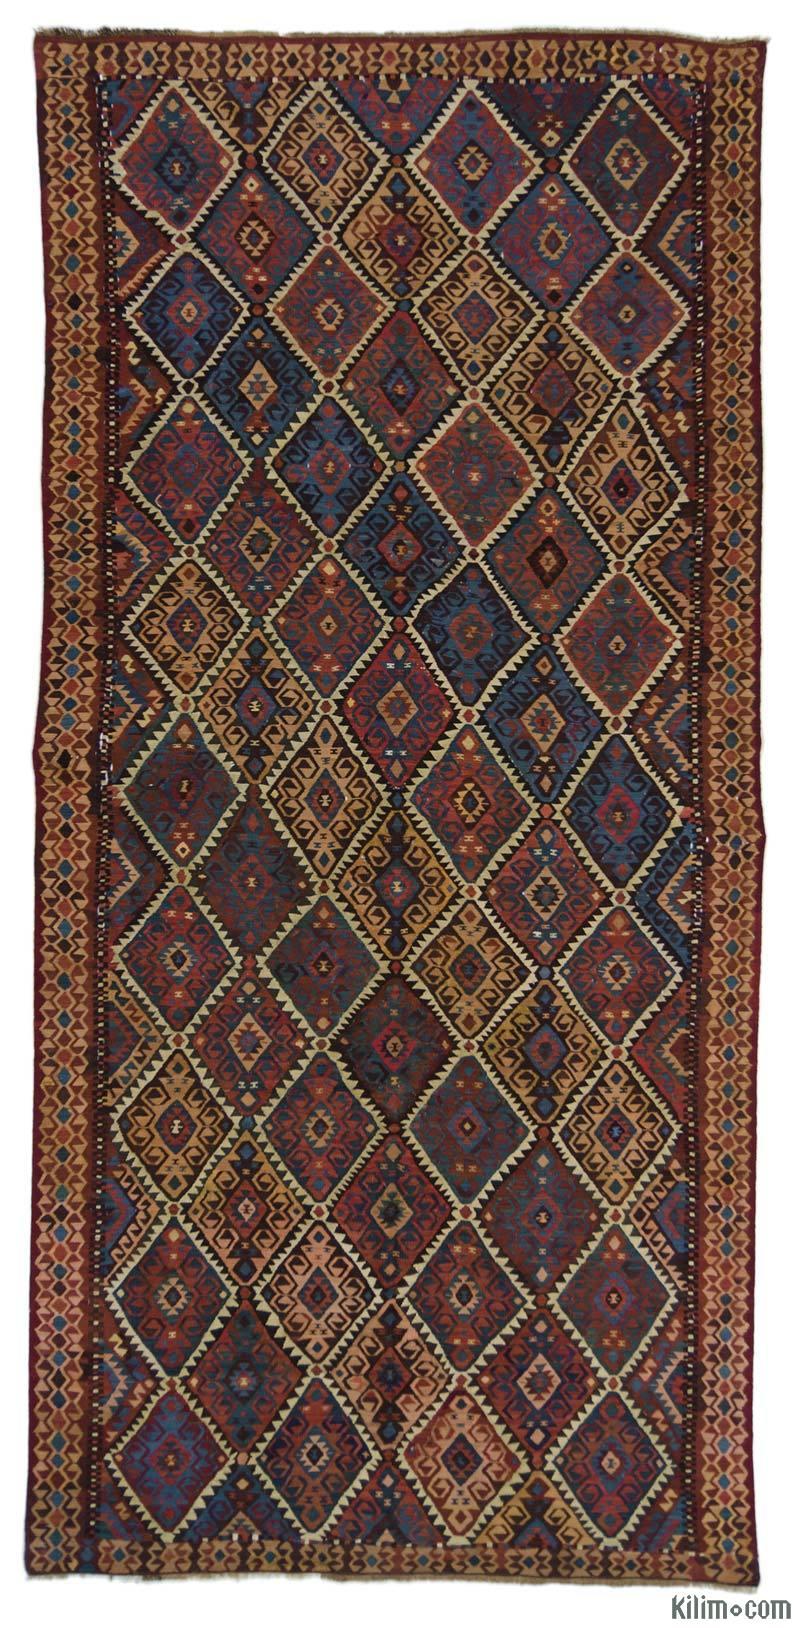 K0015963 Brown Vintage Kagizman Kilim Rug 4 11 X 10 6